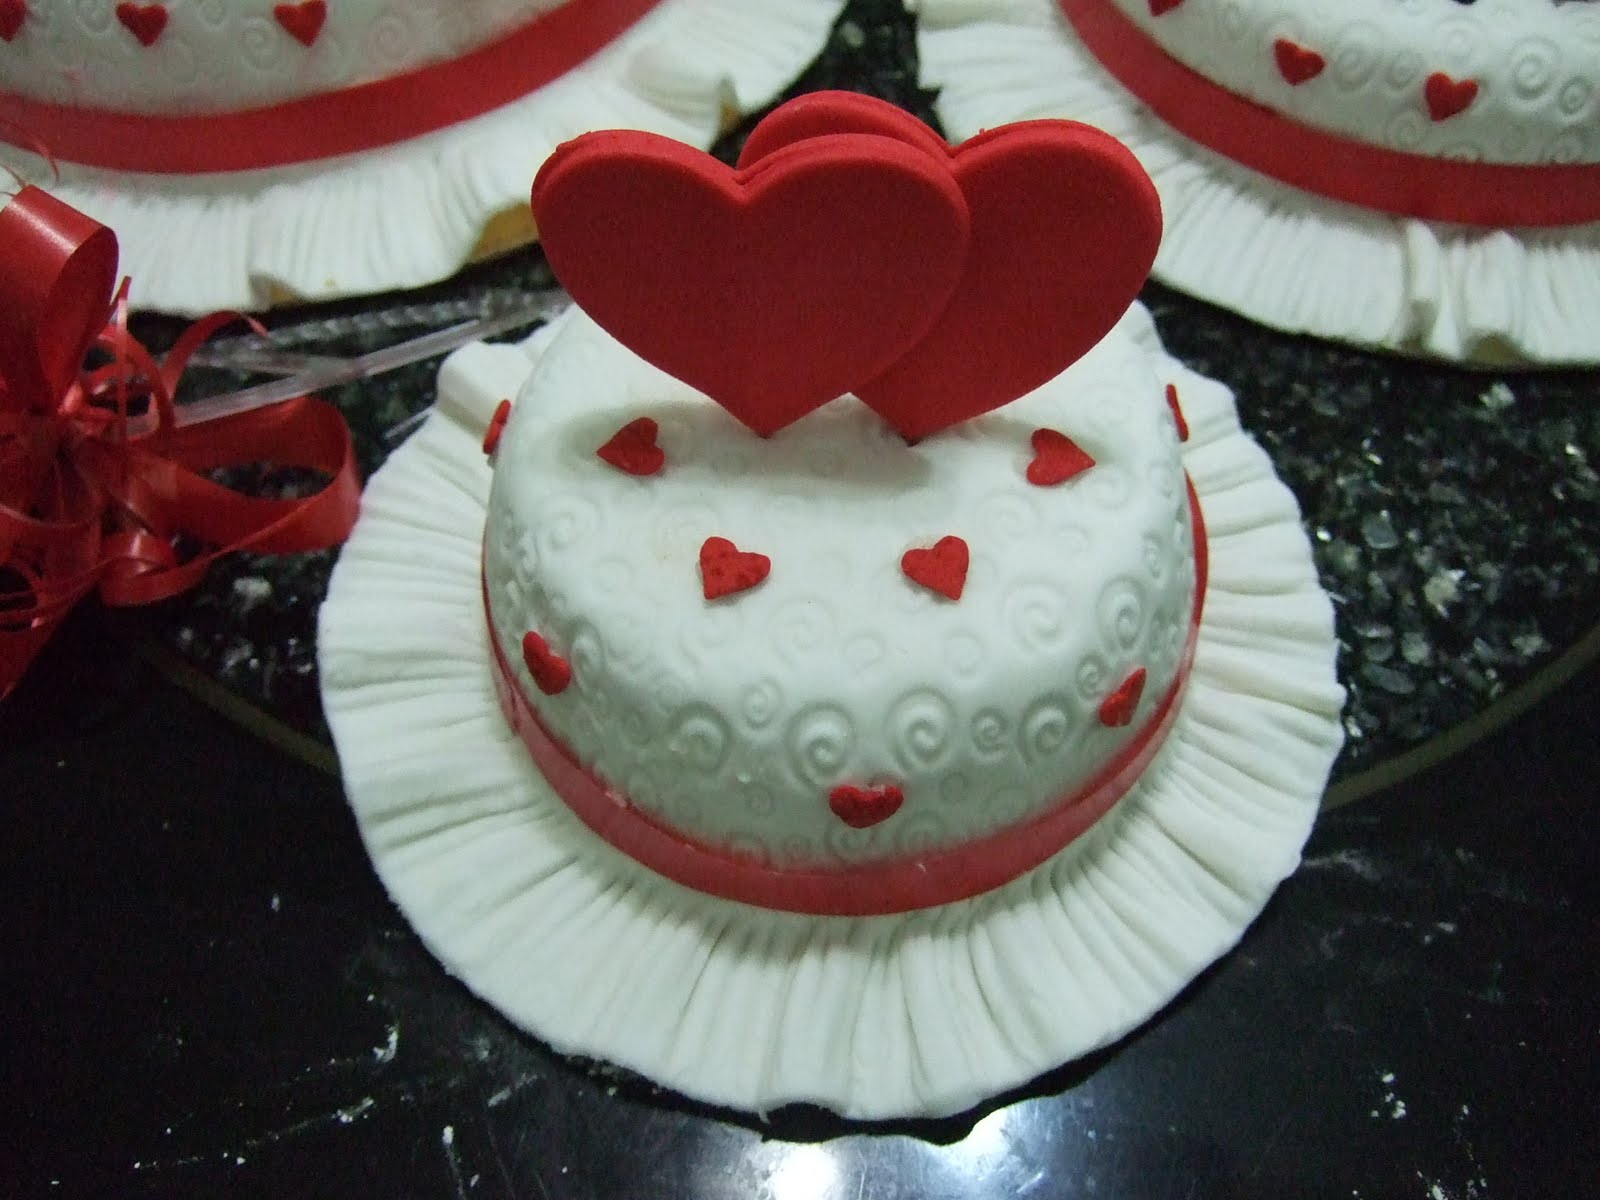 homemade fondant cakes 3 tiers Heart & Heart wedding cakes